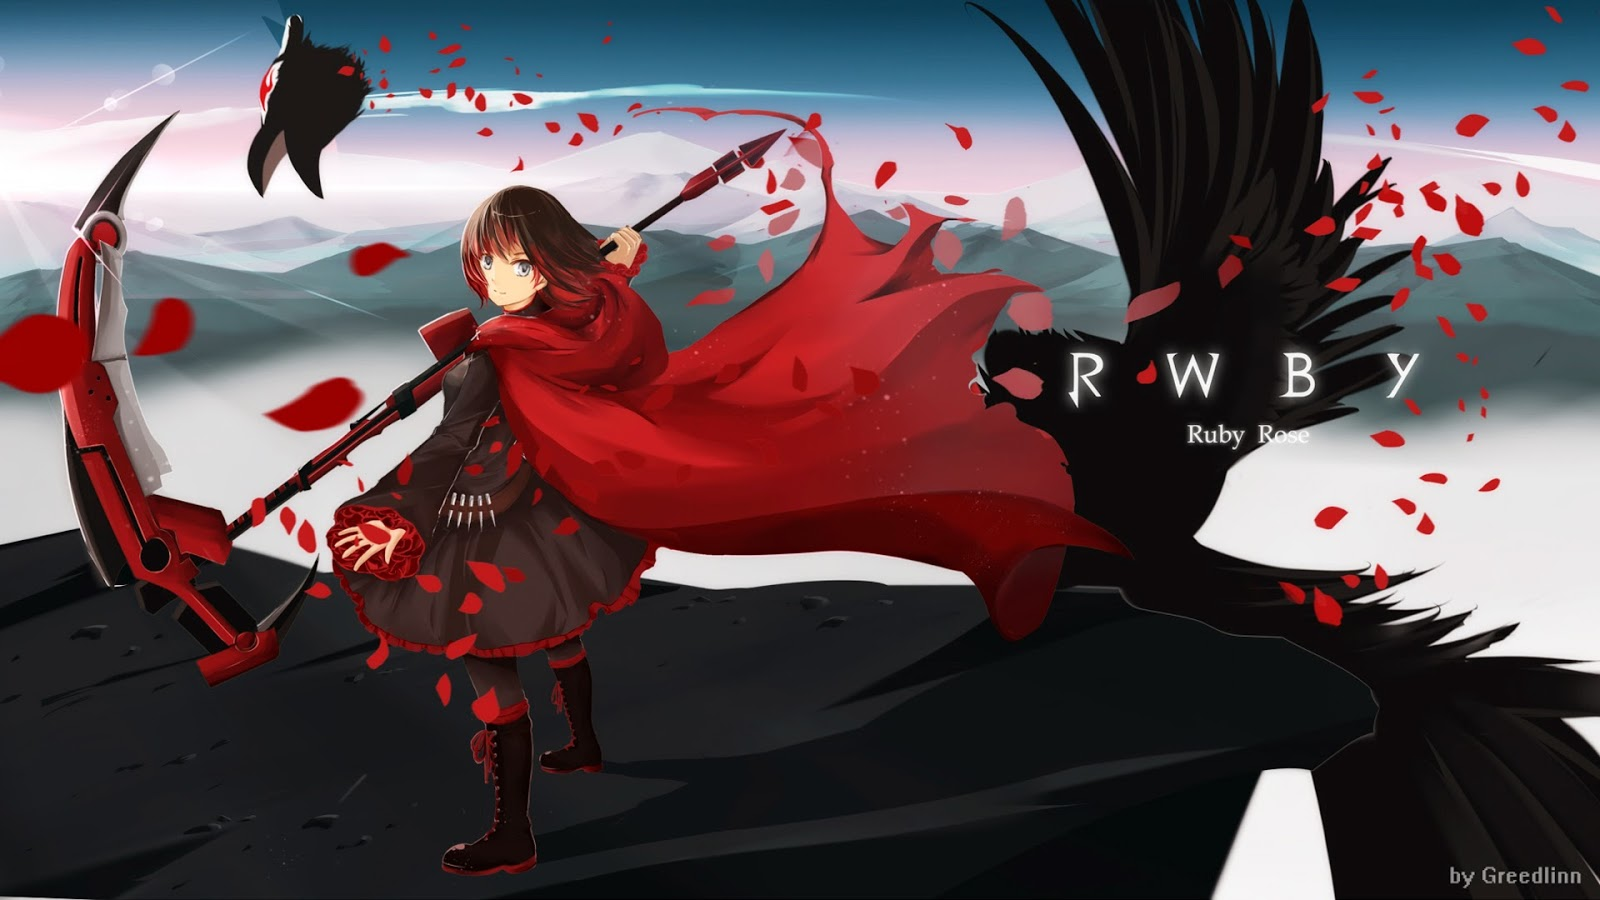 RWBY Ruby rose wallpaper hd